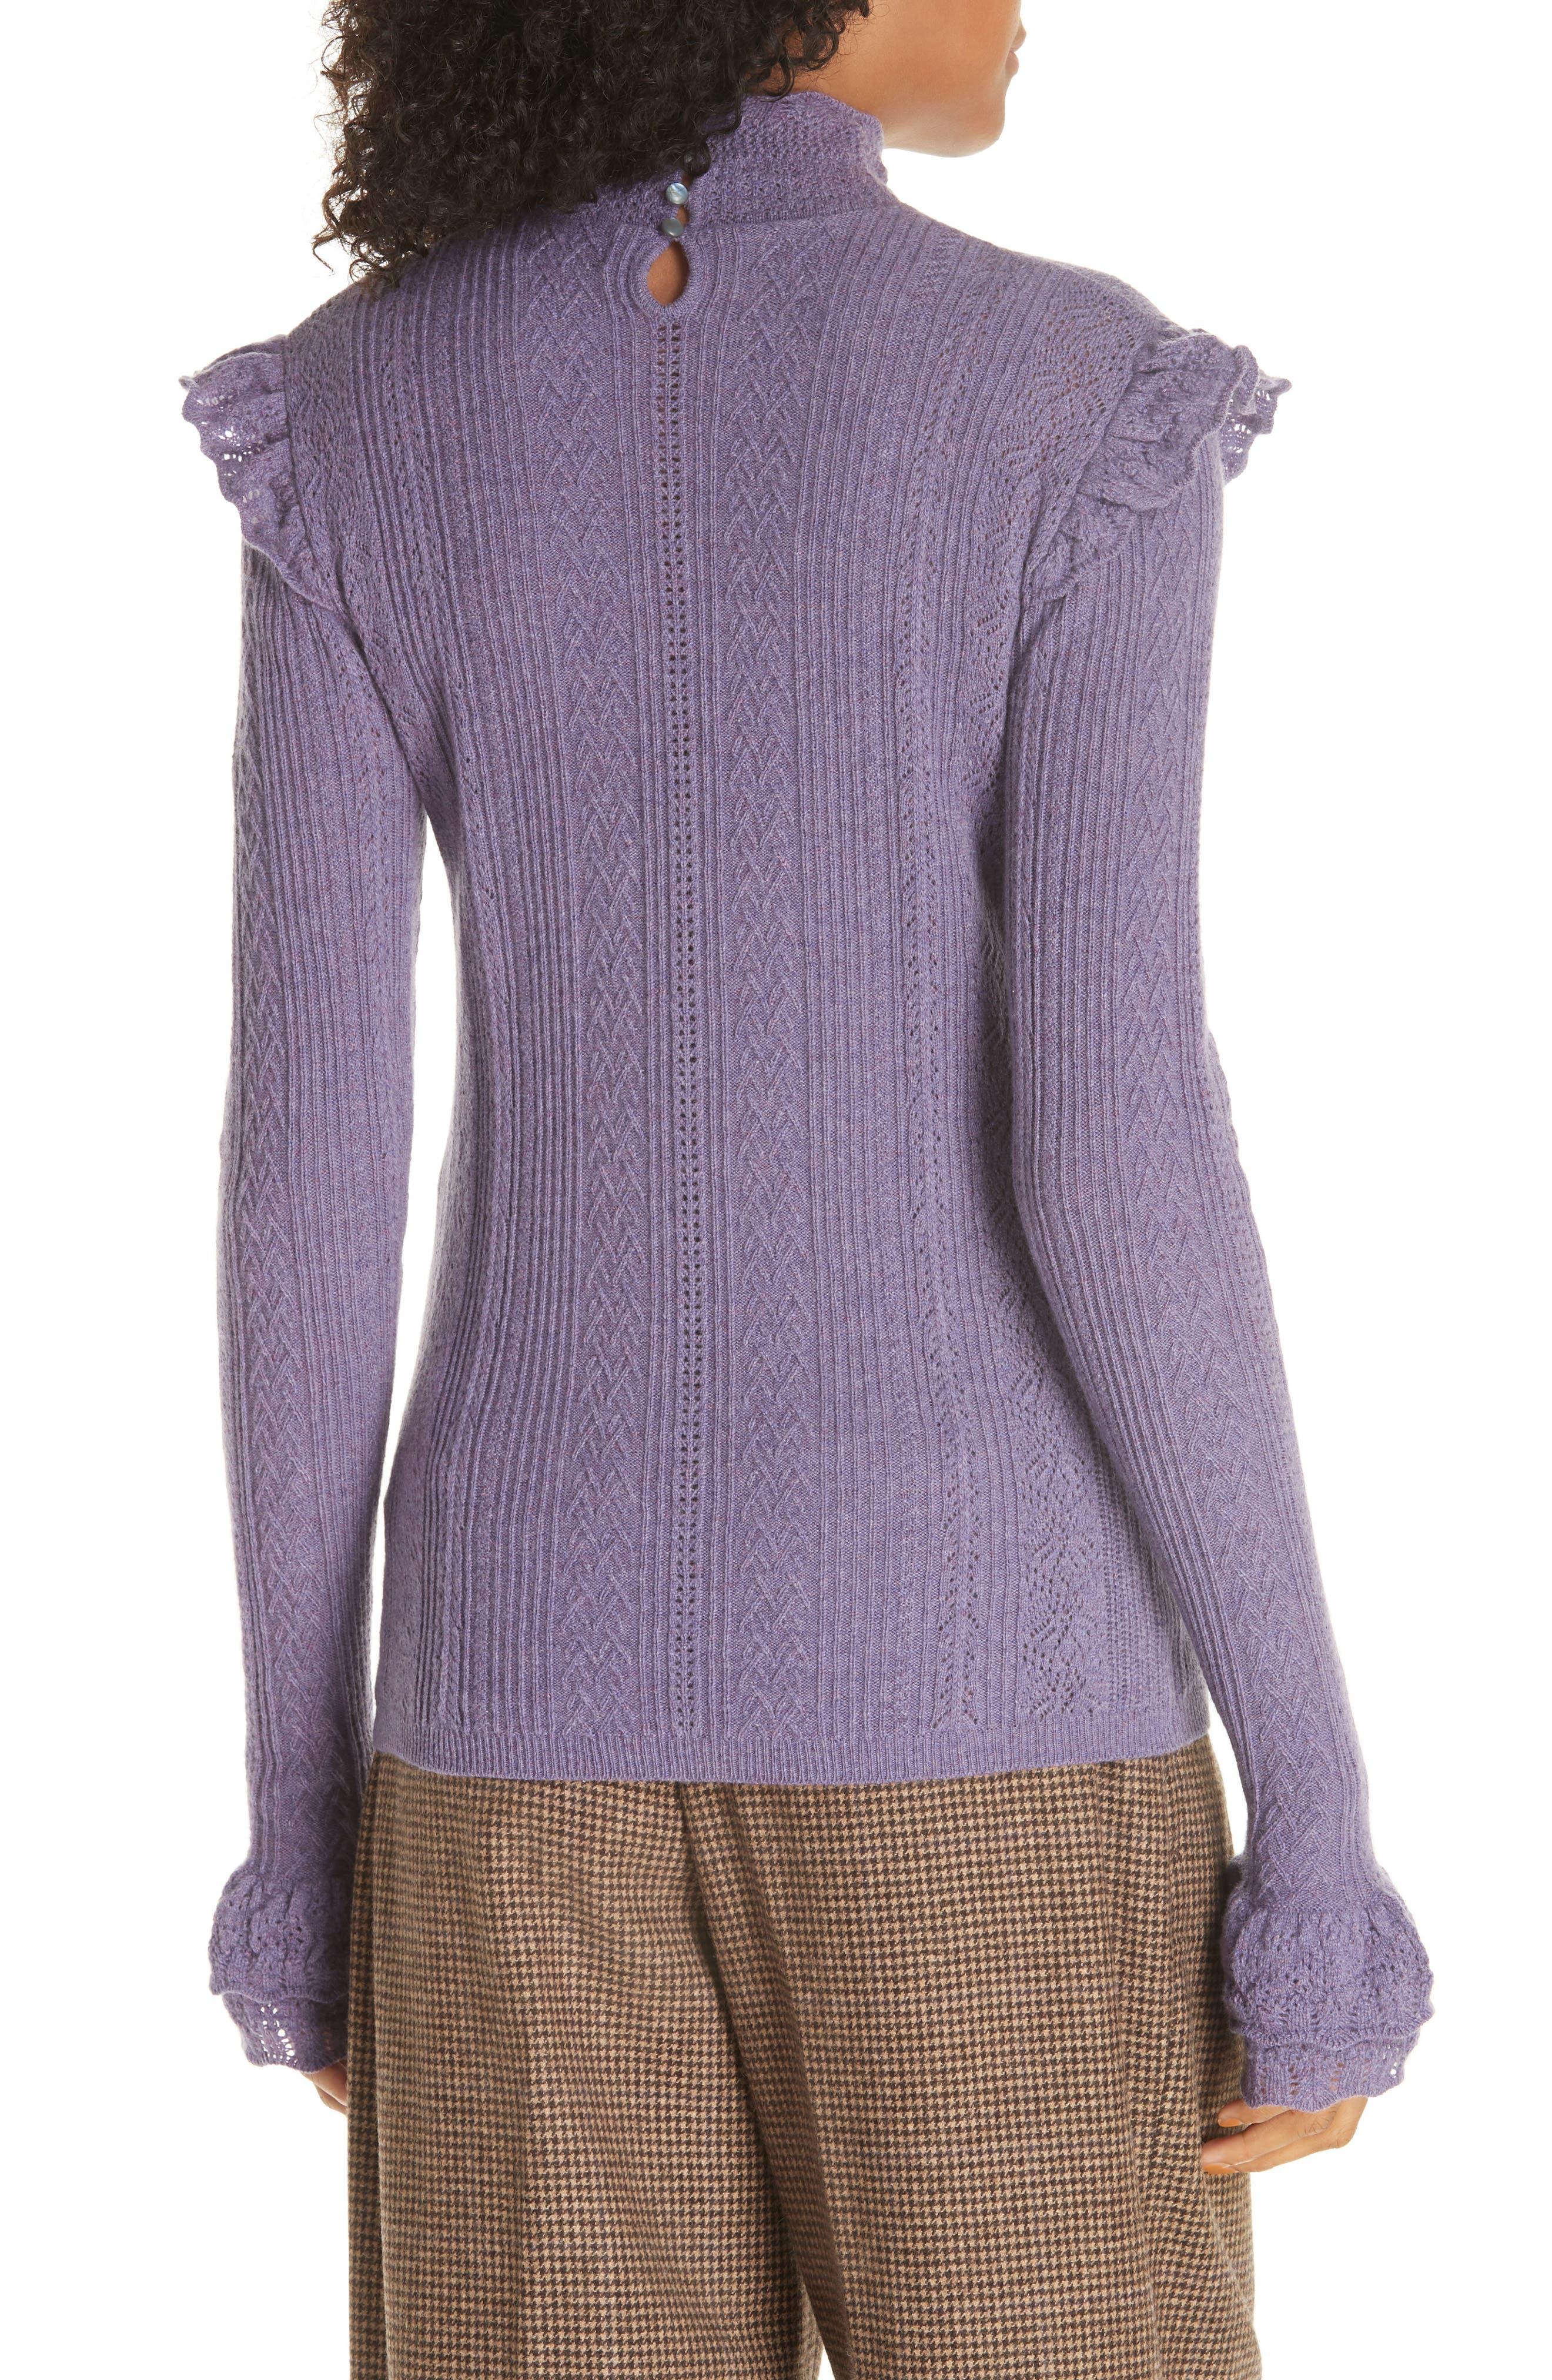 POLO RALPH LAUREN,                             Ruffle Detail Pointelle Sweater,                             Alternate thumbnail 2, color,                             500